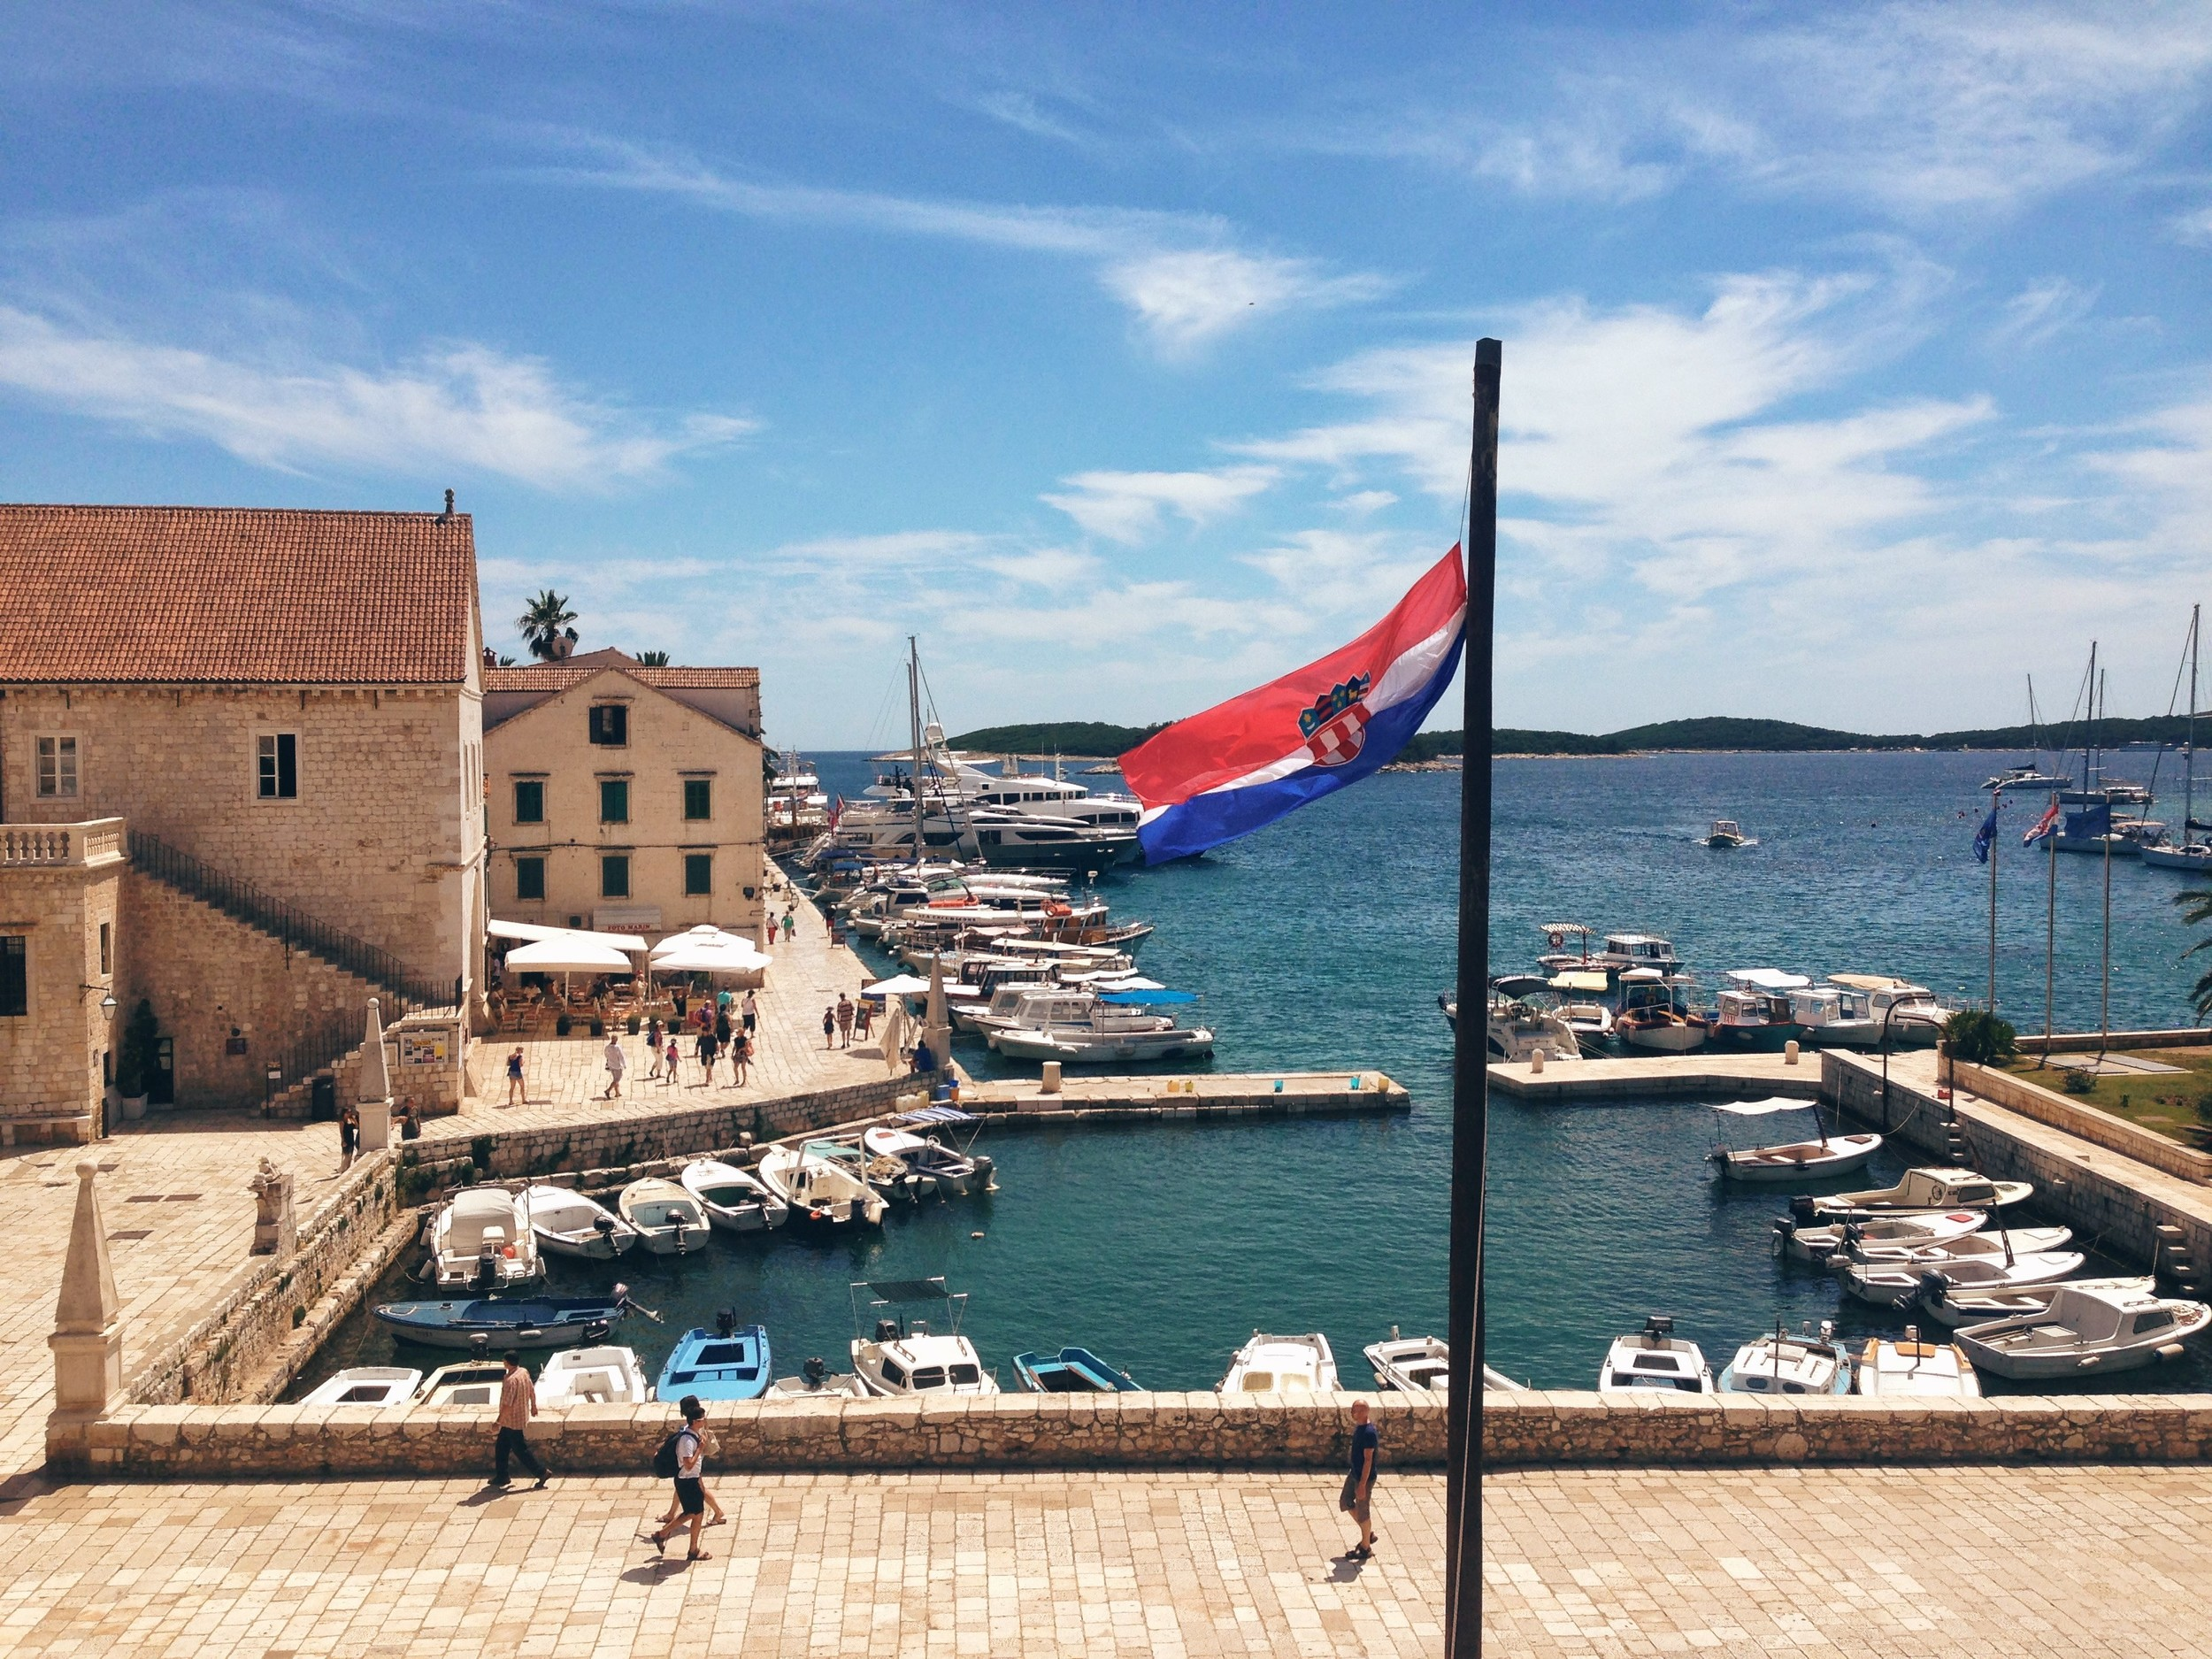 Havr's town port seaview